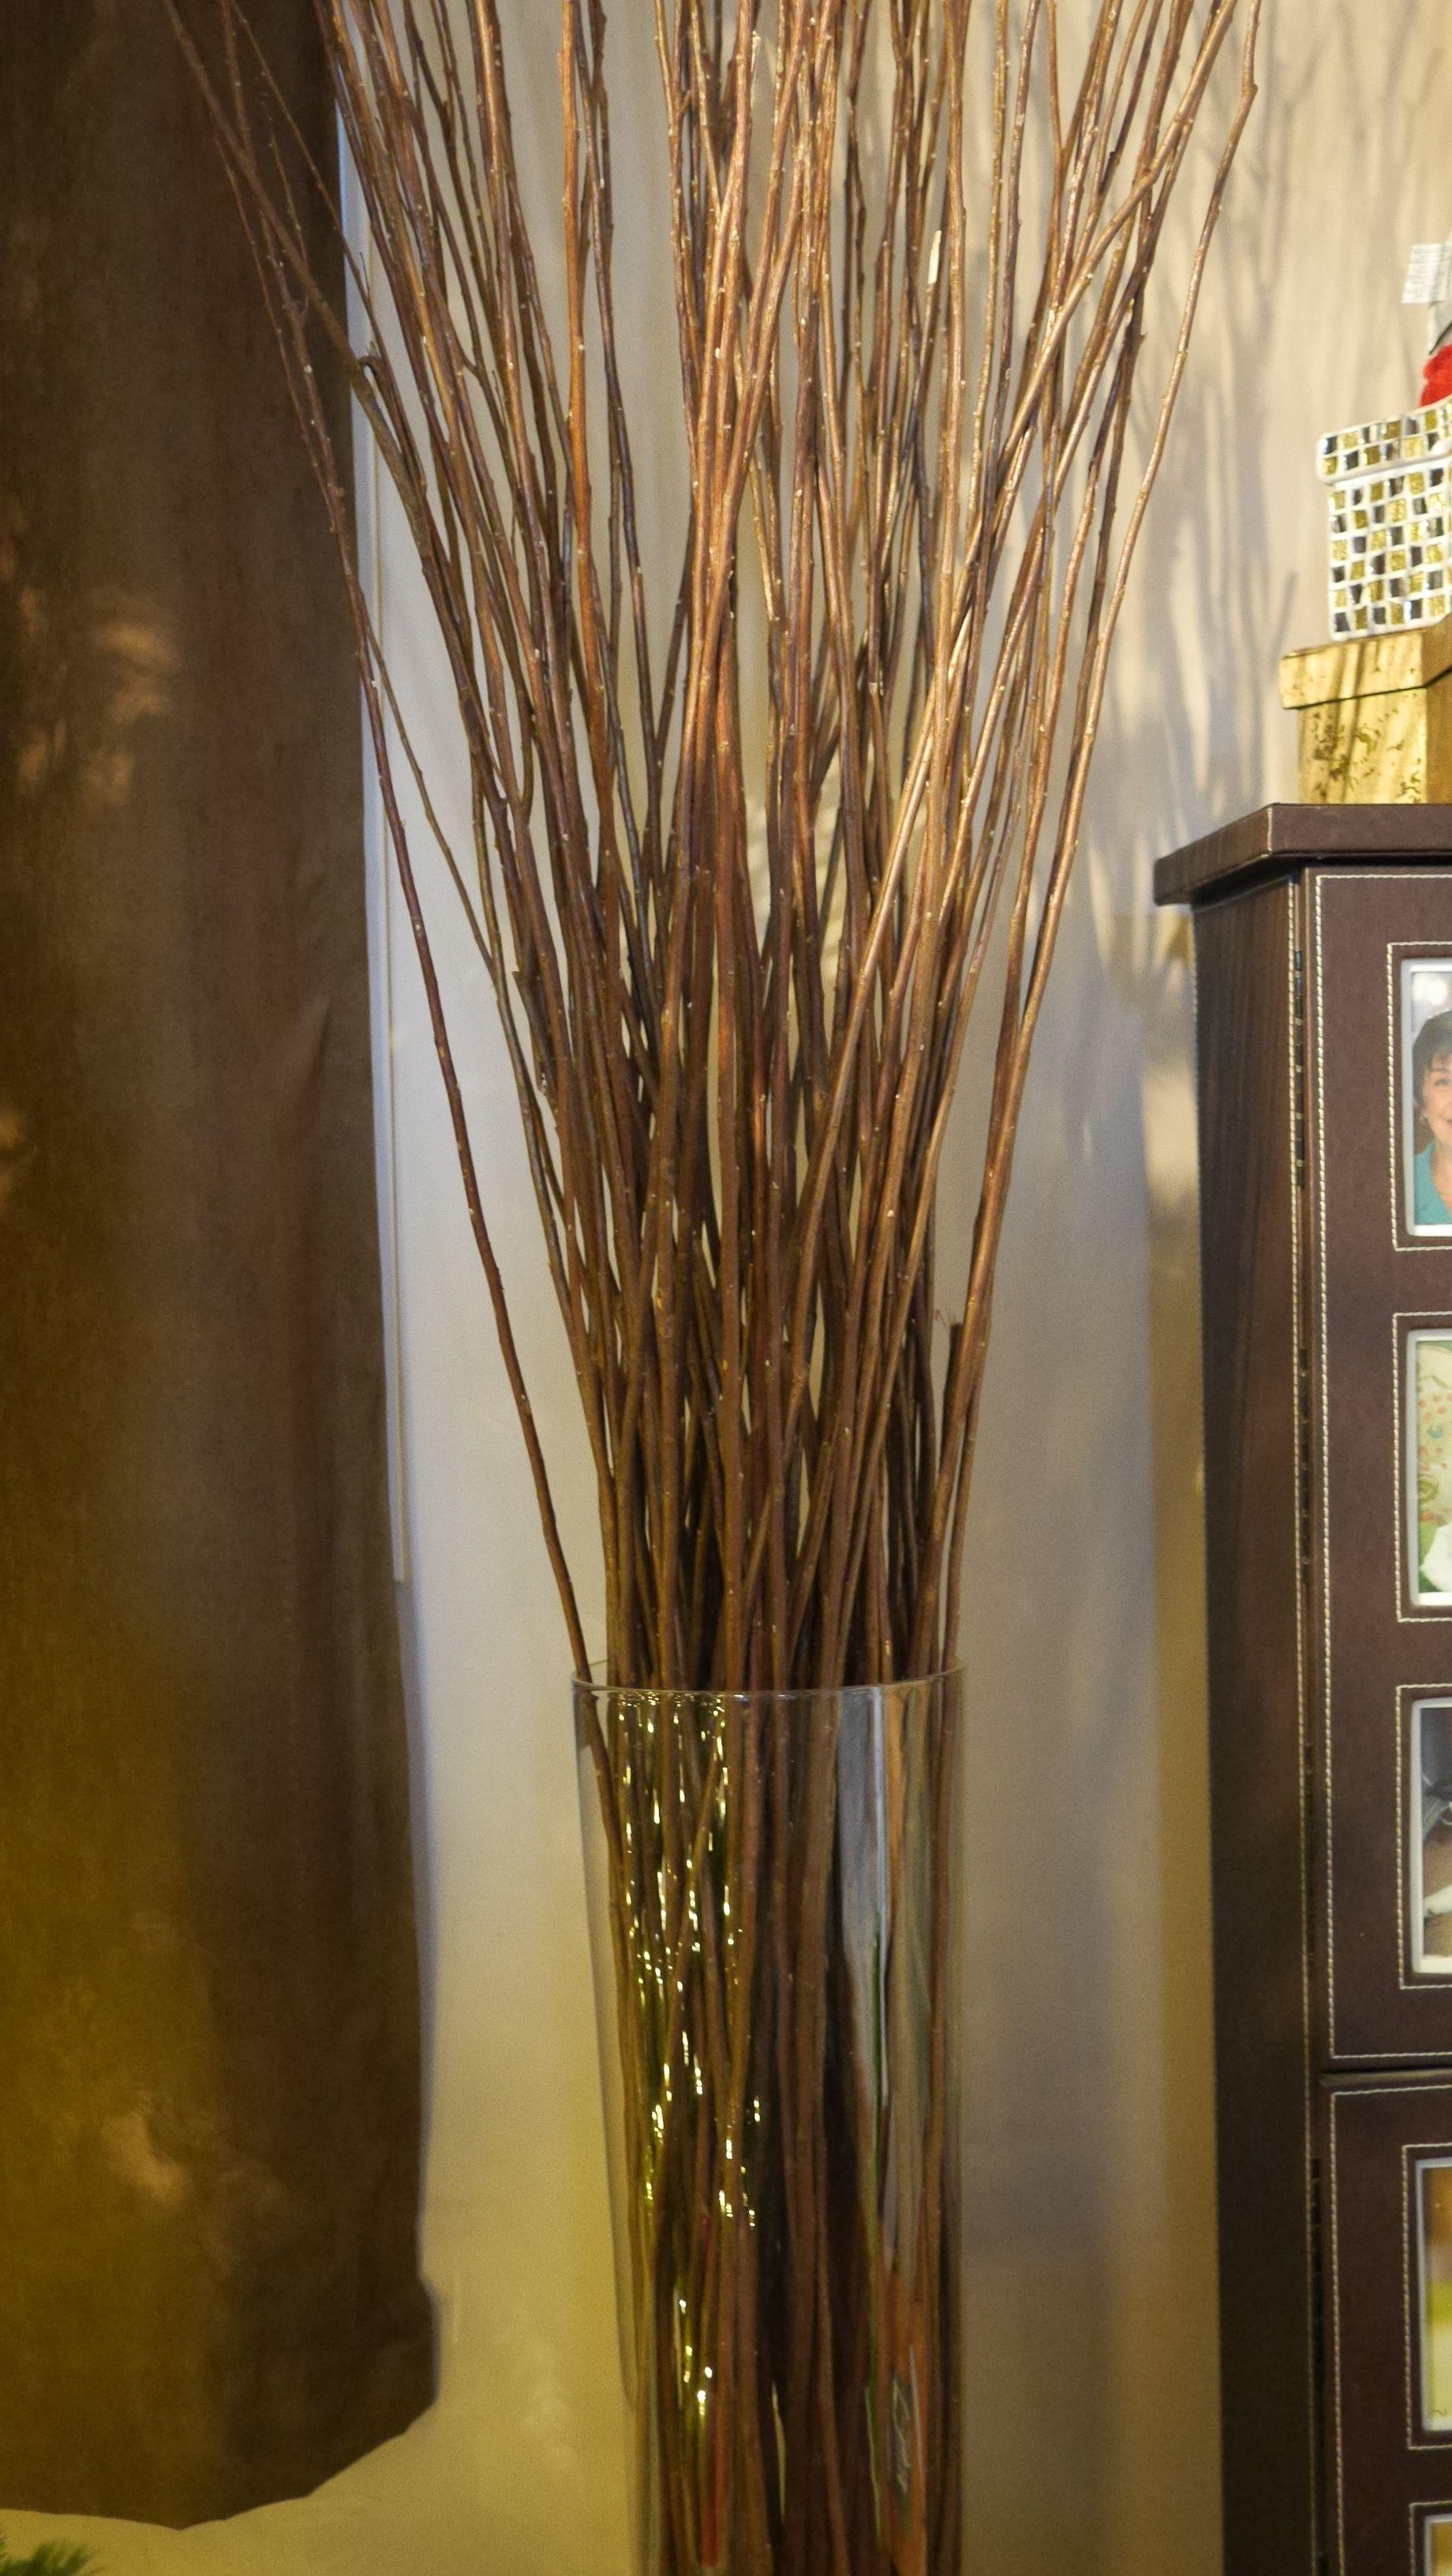 ikea floor vase with twigs  Google Search  Decor ideas